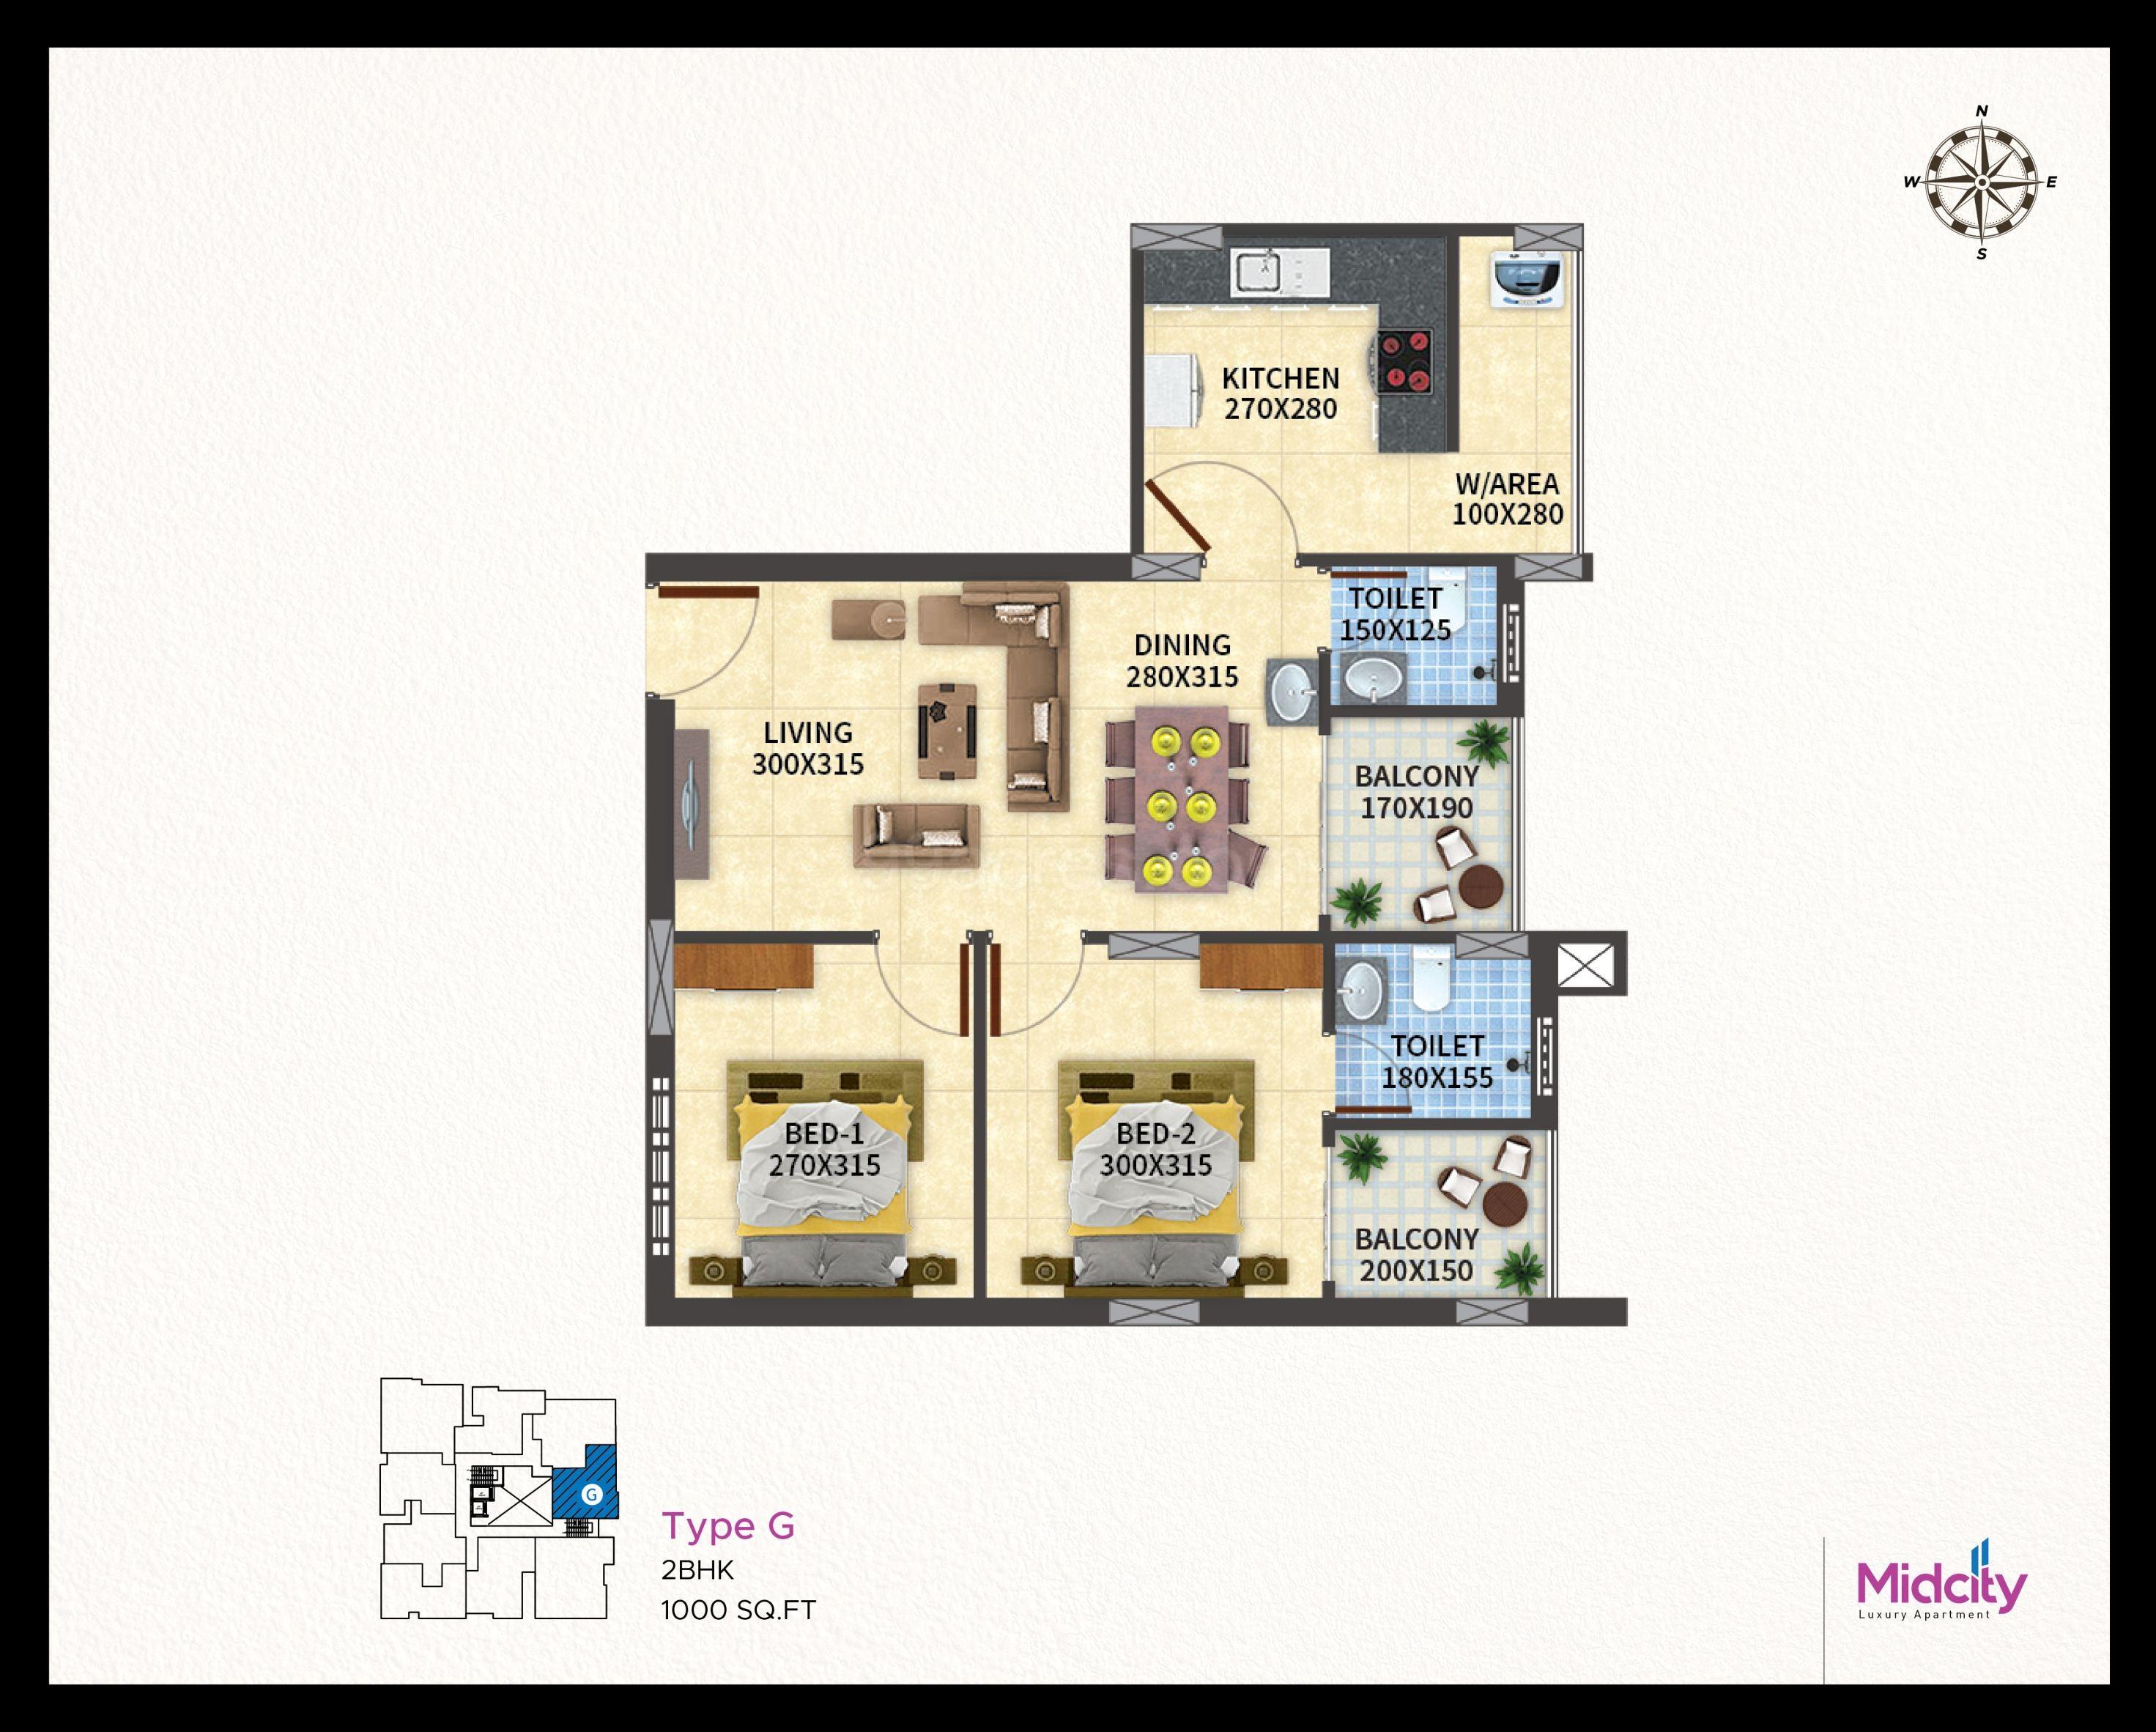 igu6oh6z Top Result 50 Beautiful Luxury townhouse Floor Plans Image 2017 Zat3